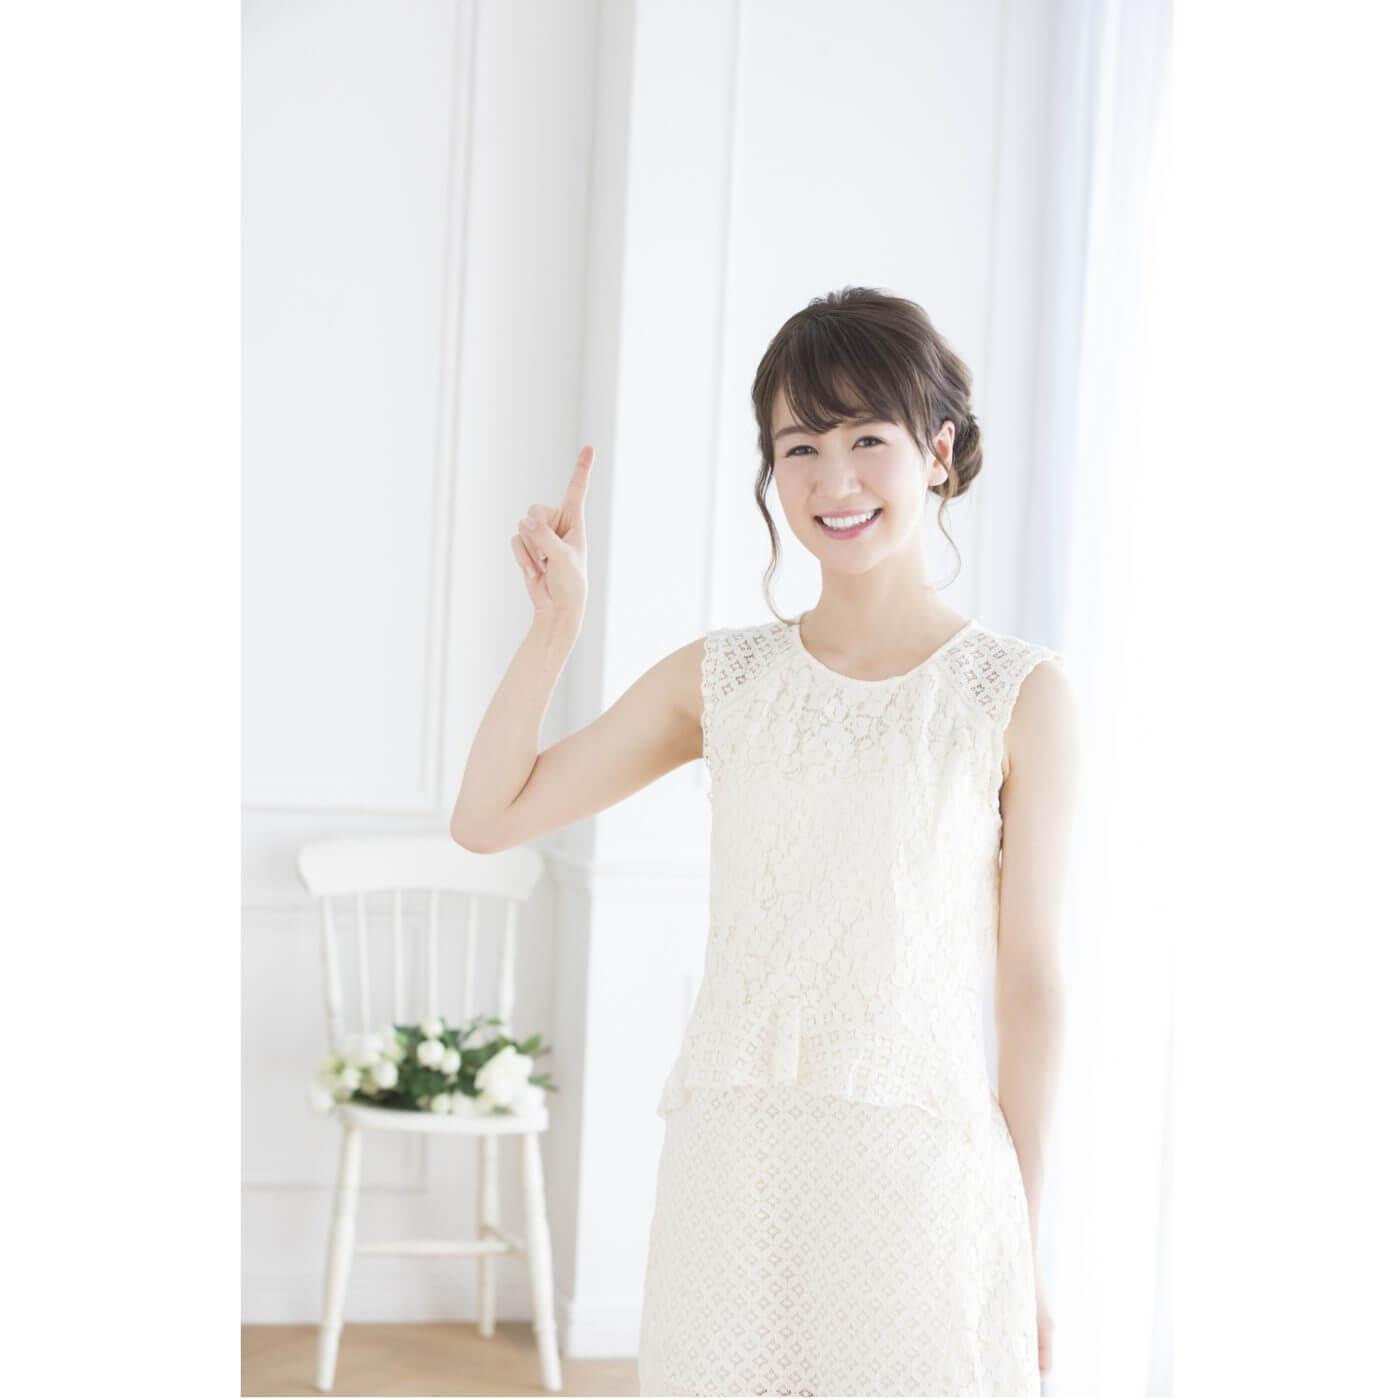 ccce898c1ca39 真っ白・真っ黒コーデはNG. 花嫁の特権「純白のウェディングドレス」。